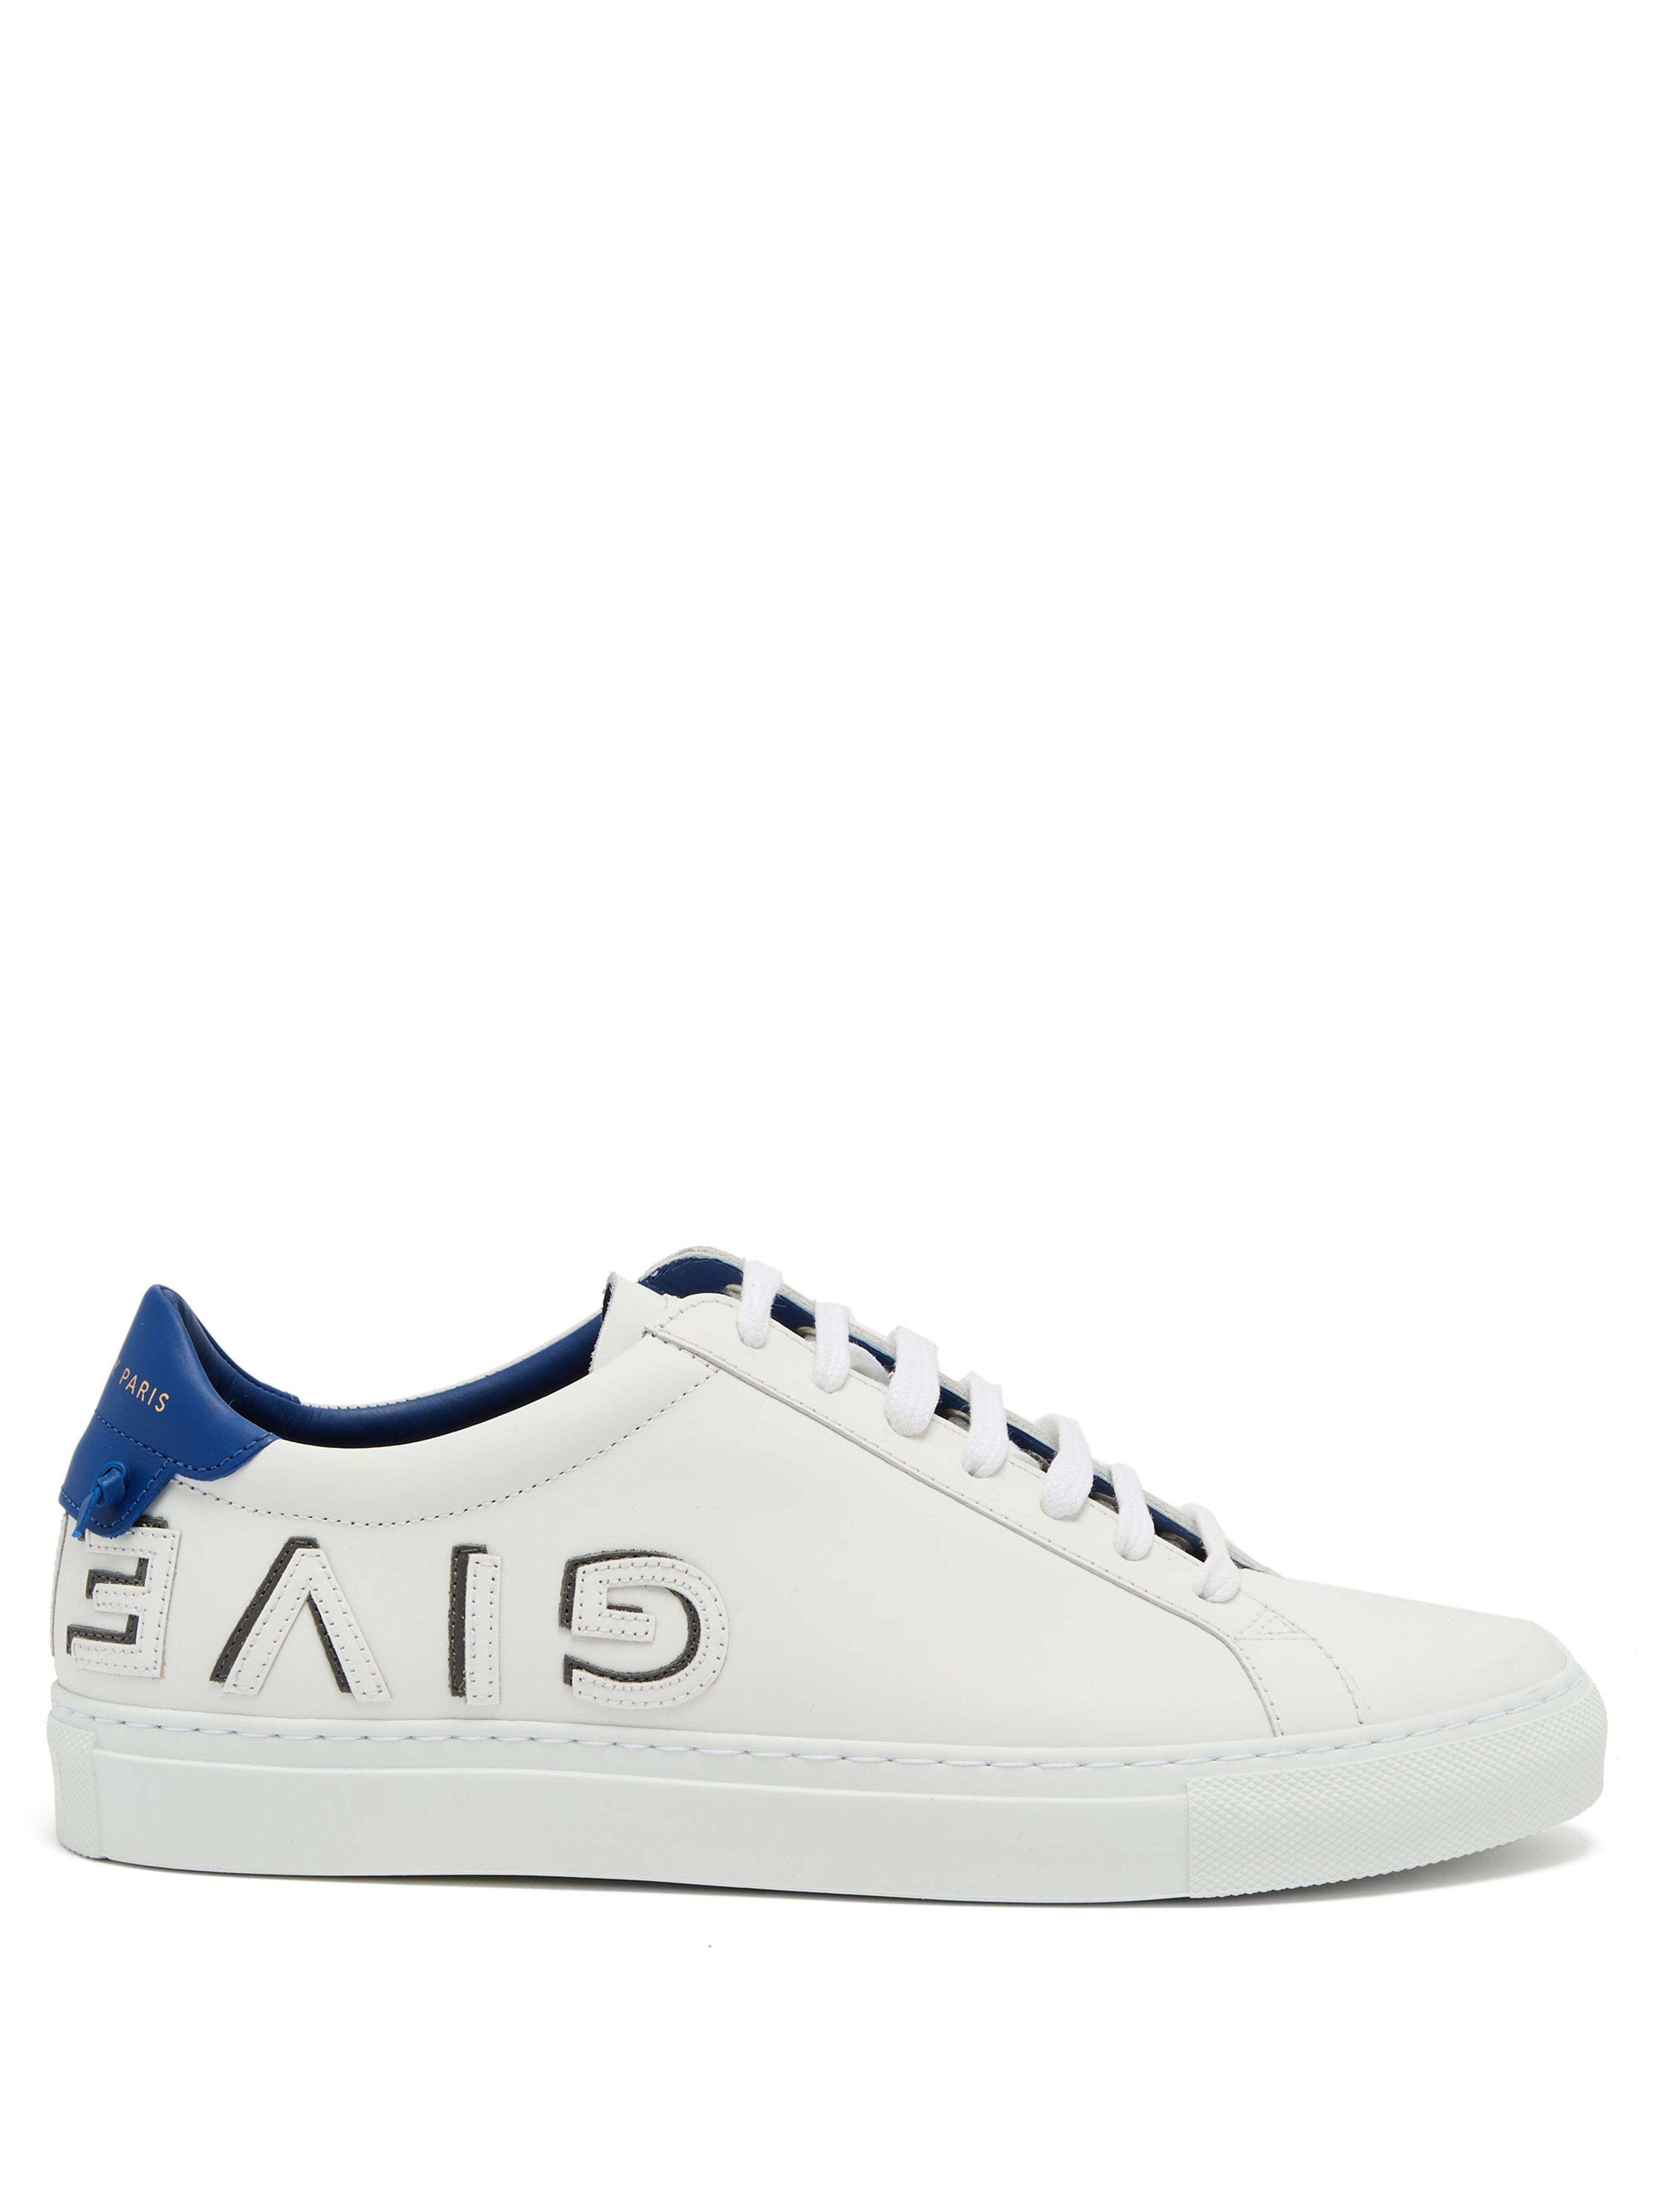 a4a4b8330dbc81 Lyst - Baskets basses en cuir Urban Street Givenchy en coloris Blanc